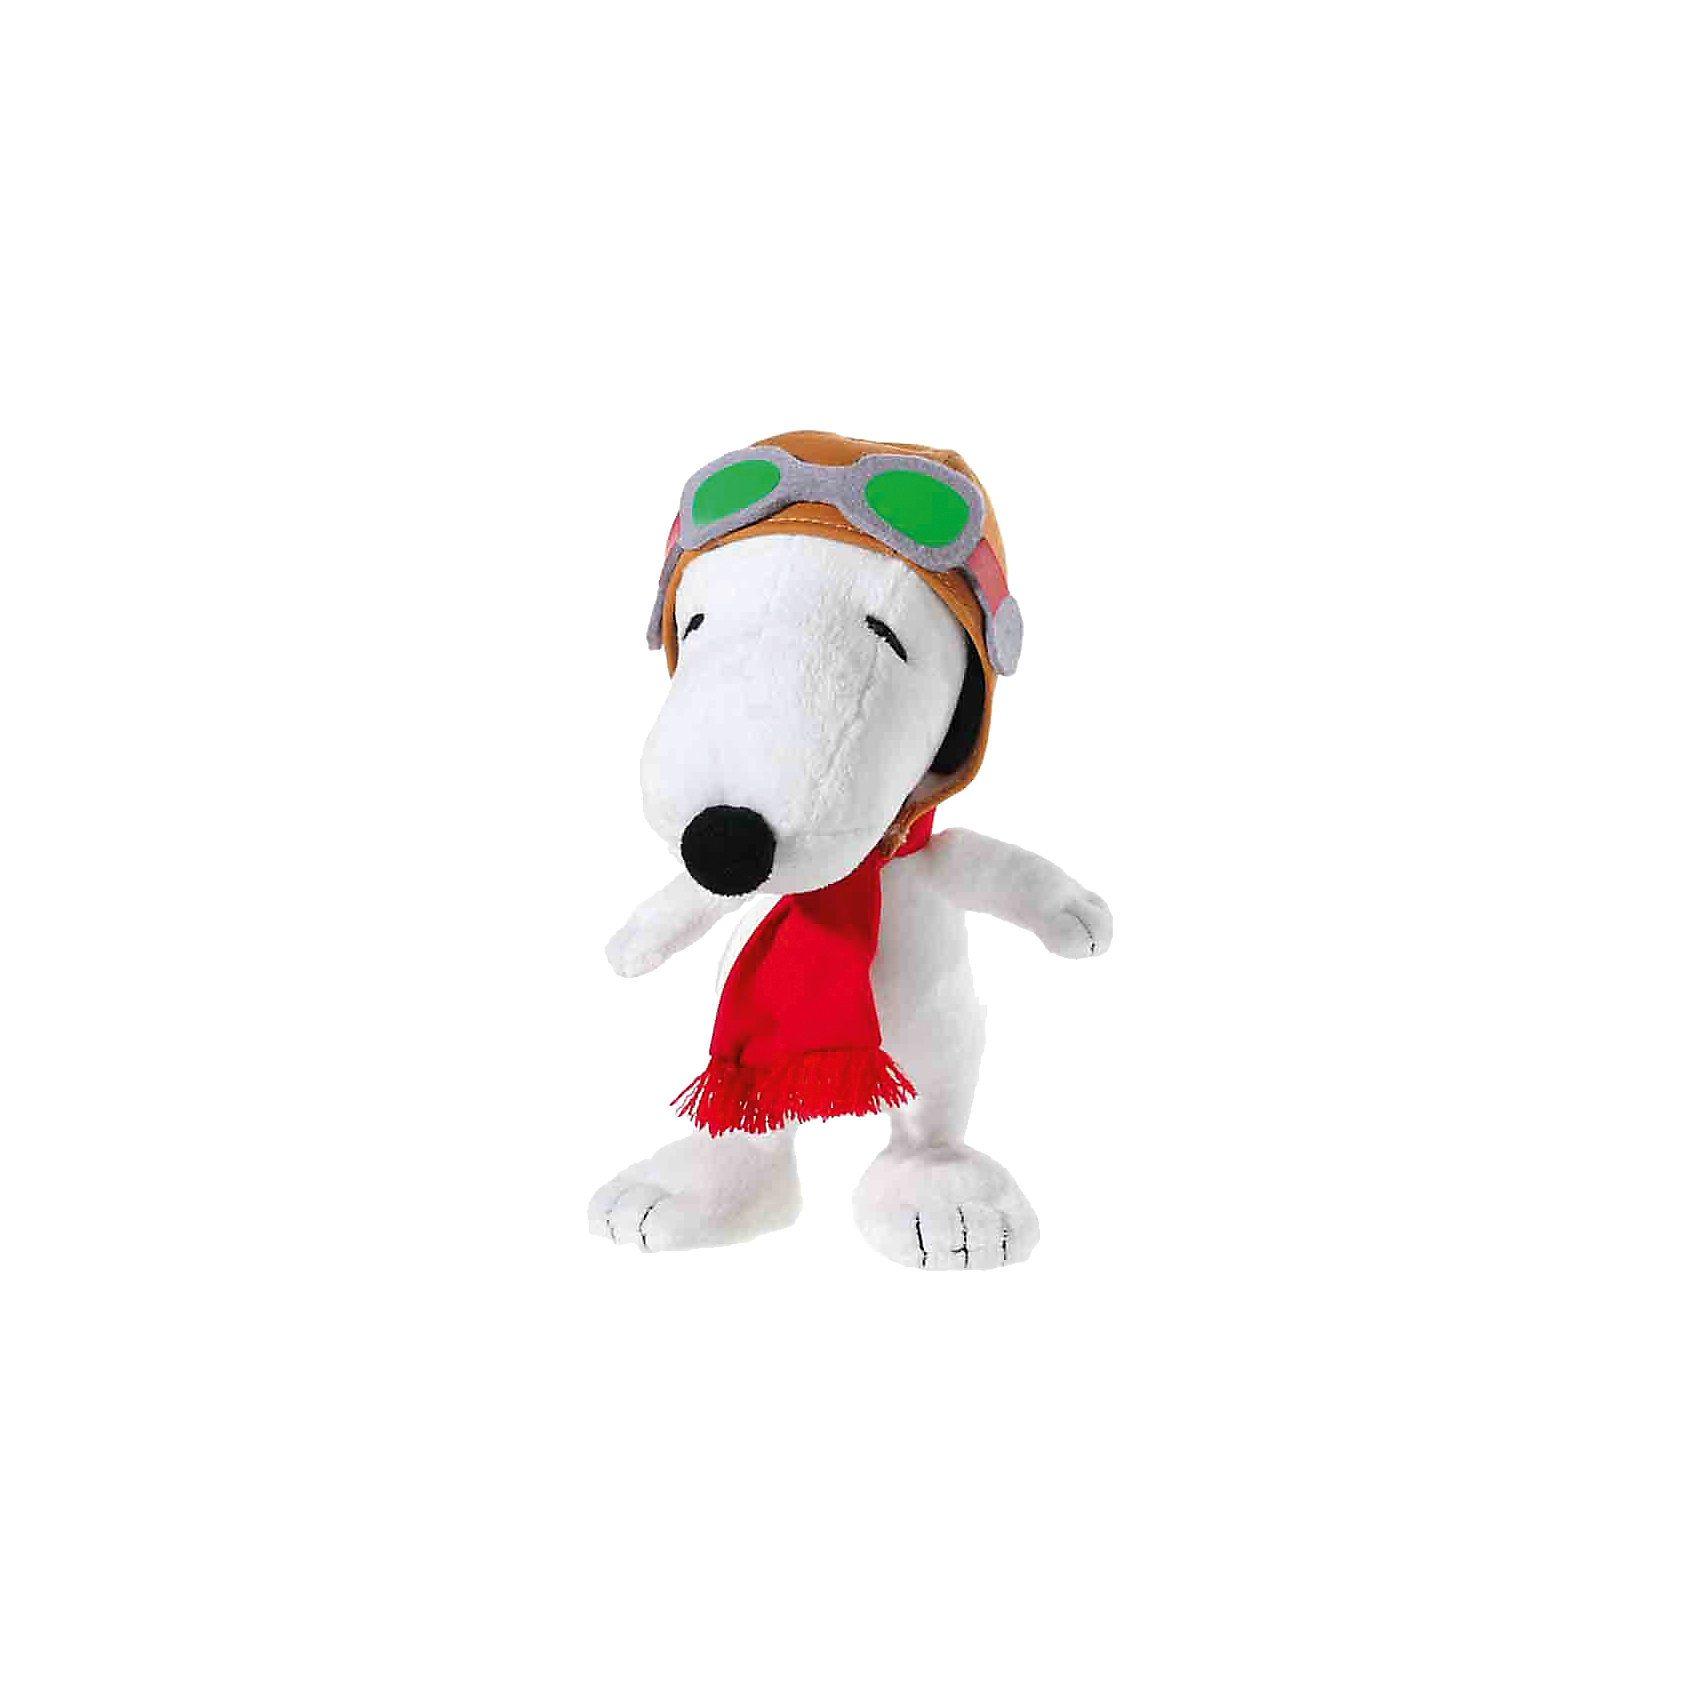 Heunec Snoopy Flying Ace 18cm